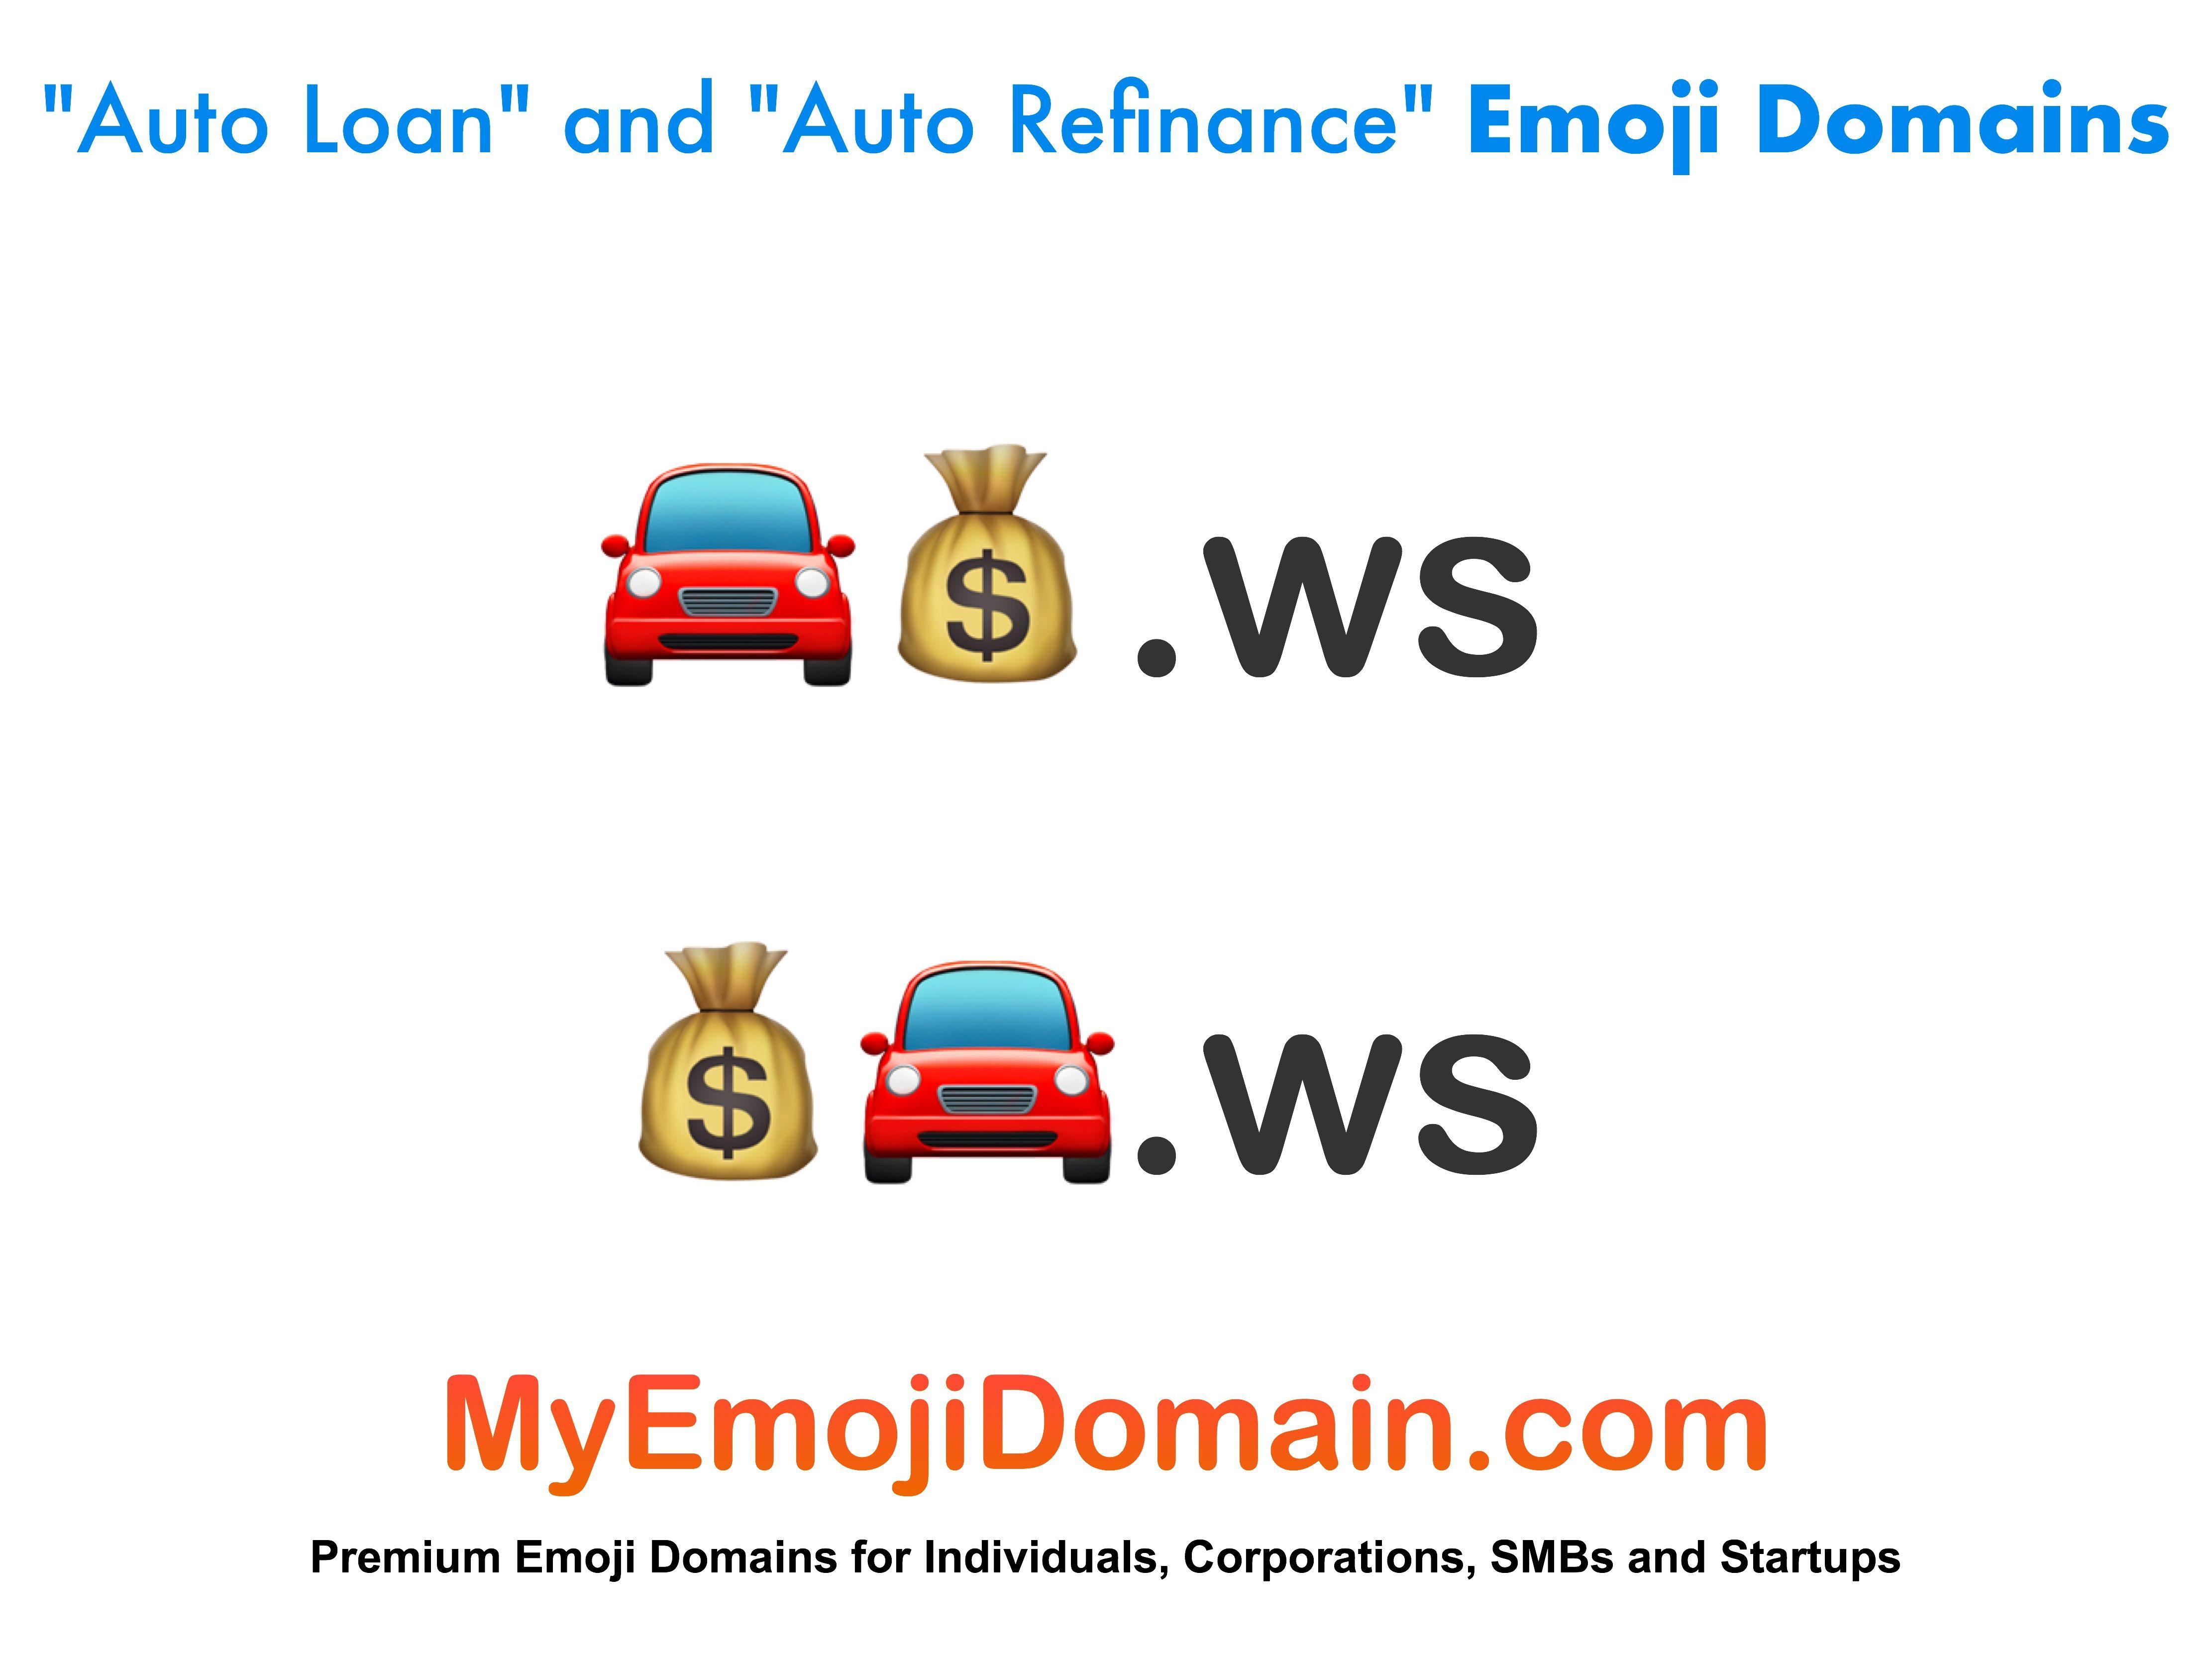 Premium Auto Loan and Auto Refinance Emoji Domain Names